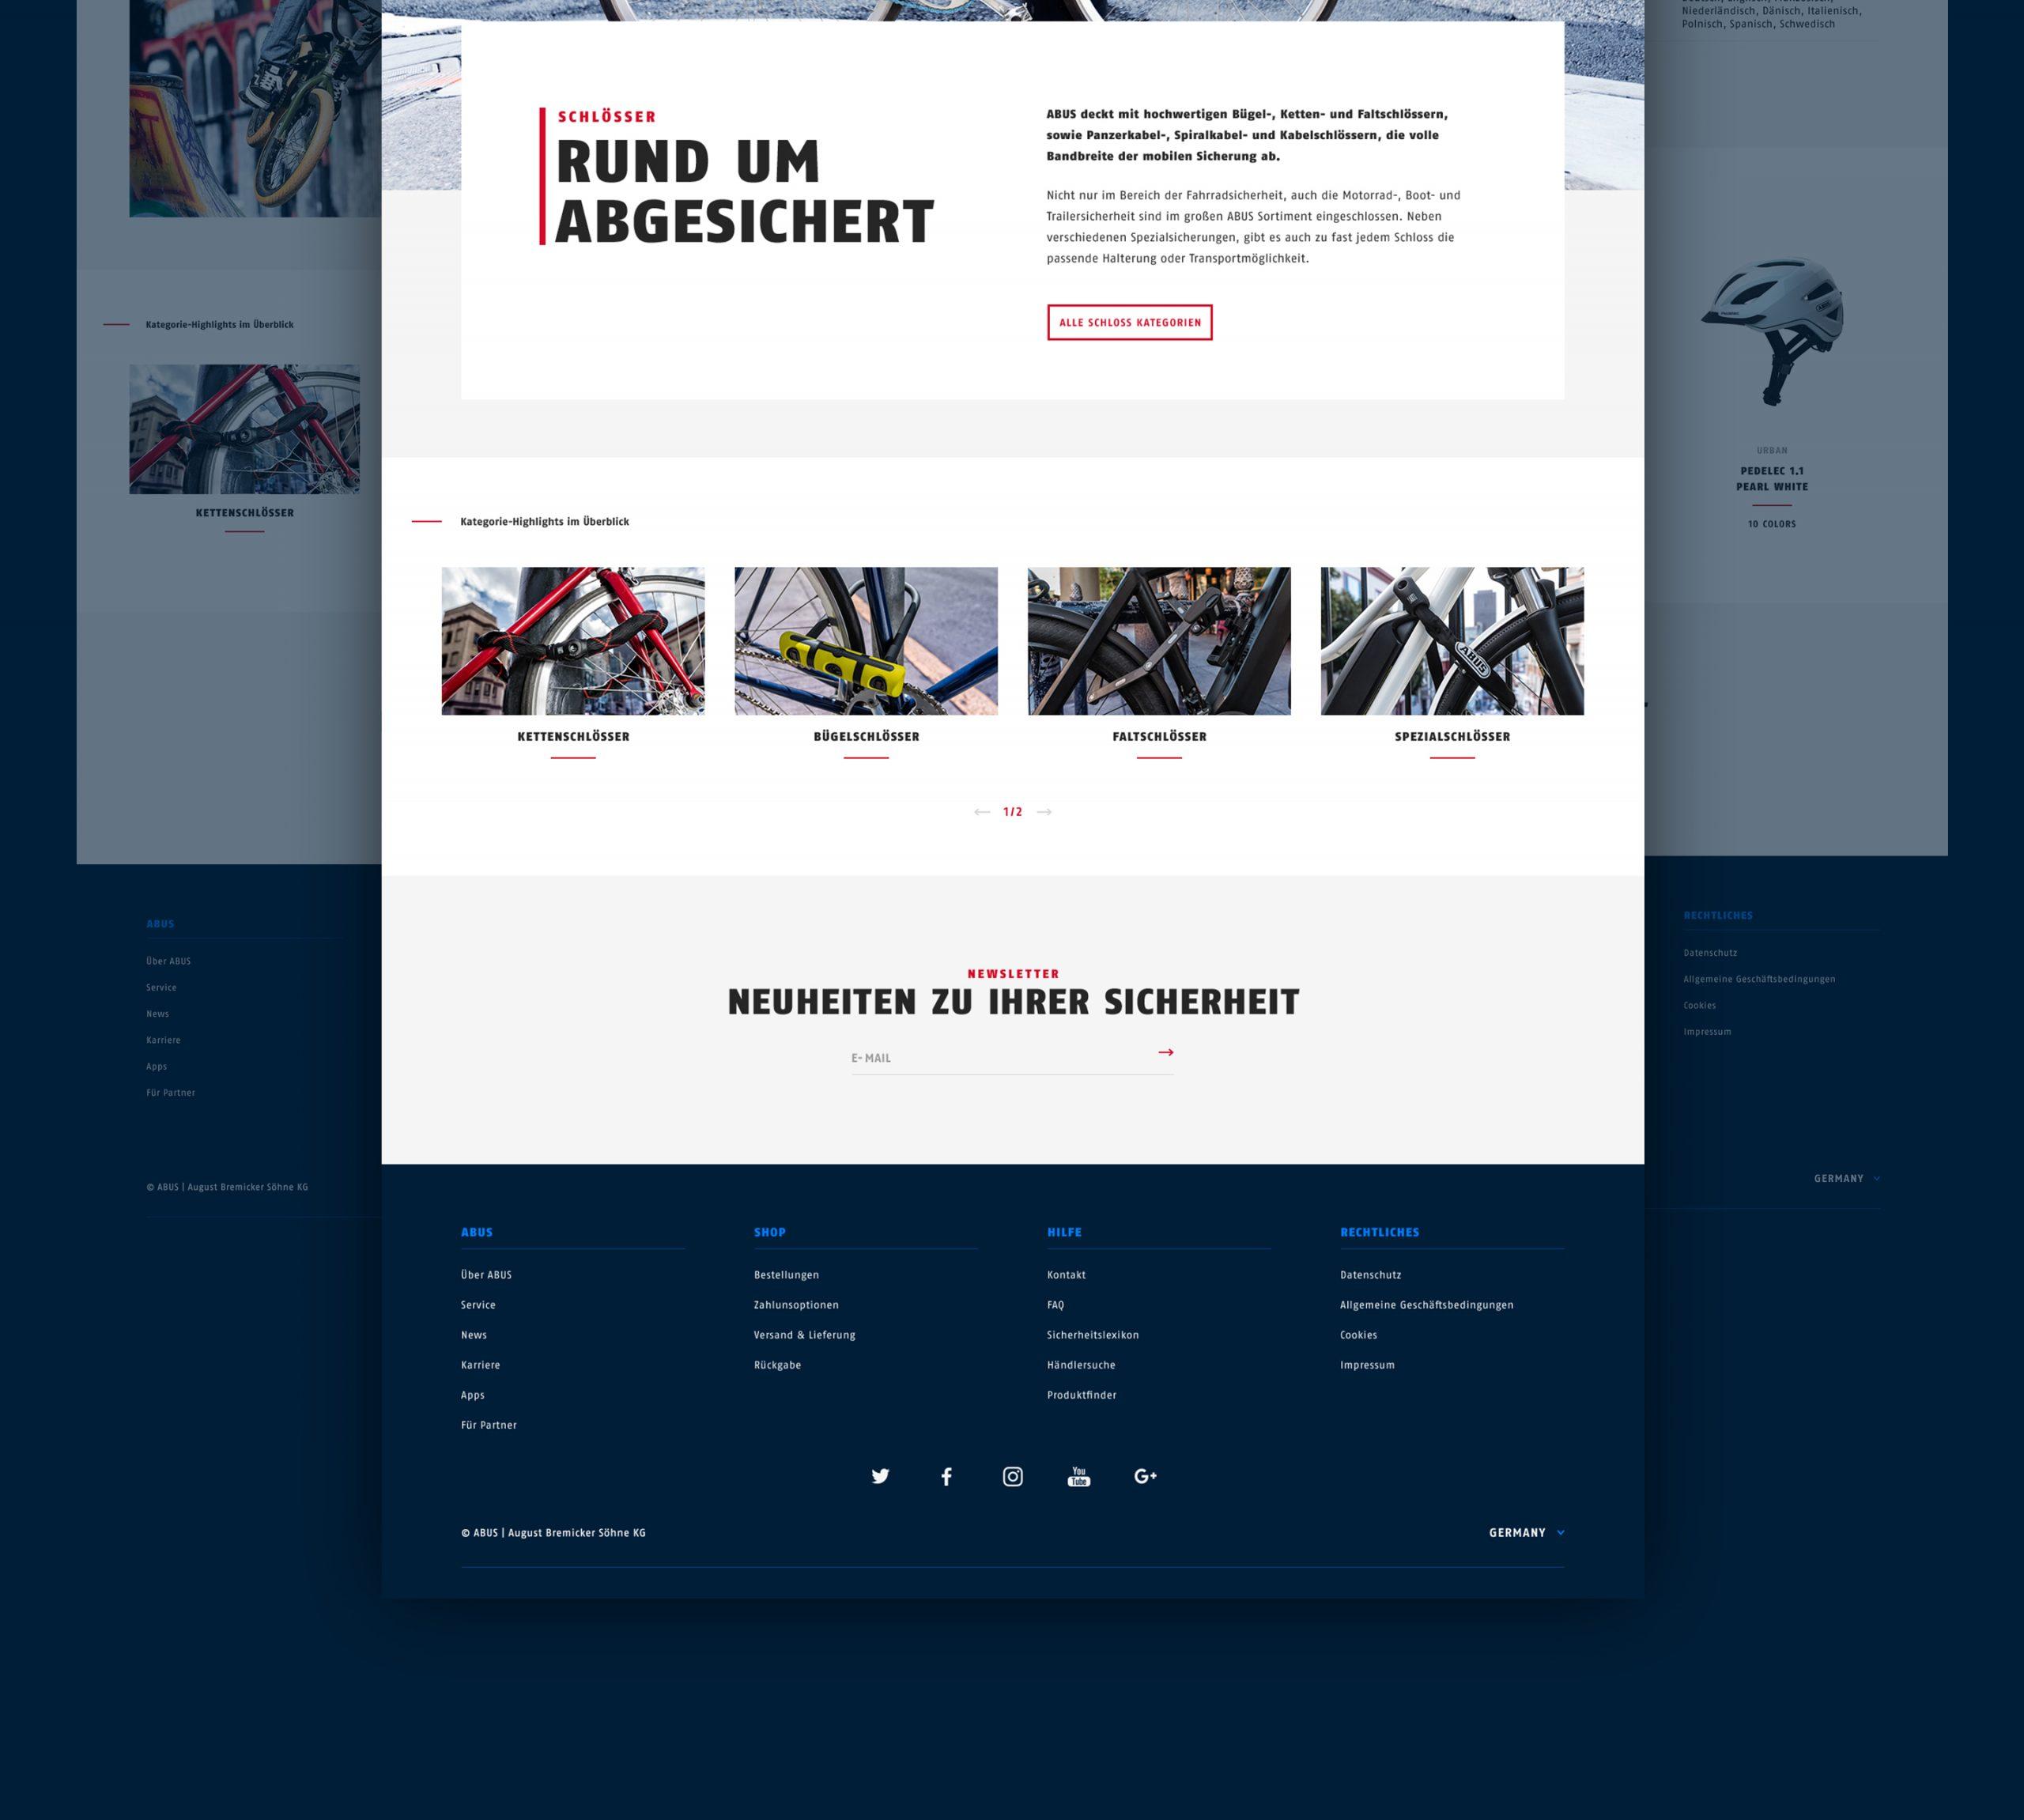 pascher-heinz-abus-website-digital-design-03